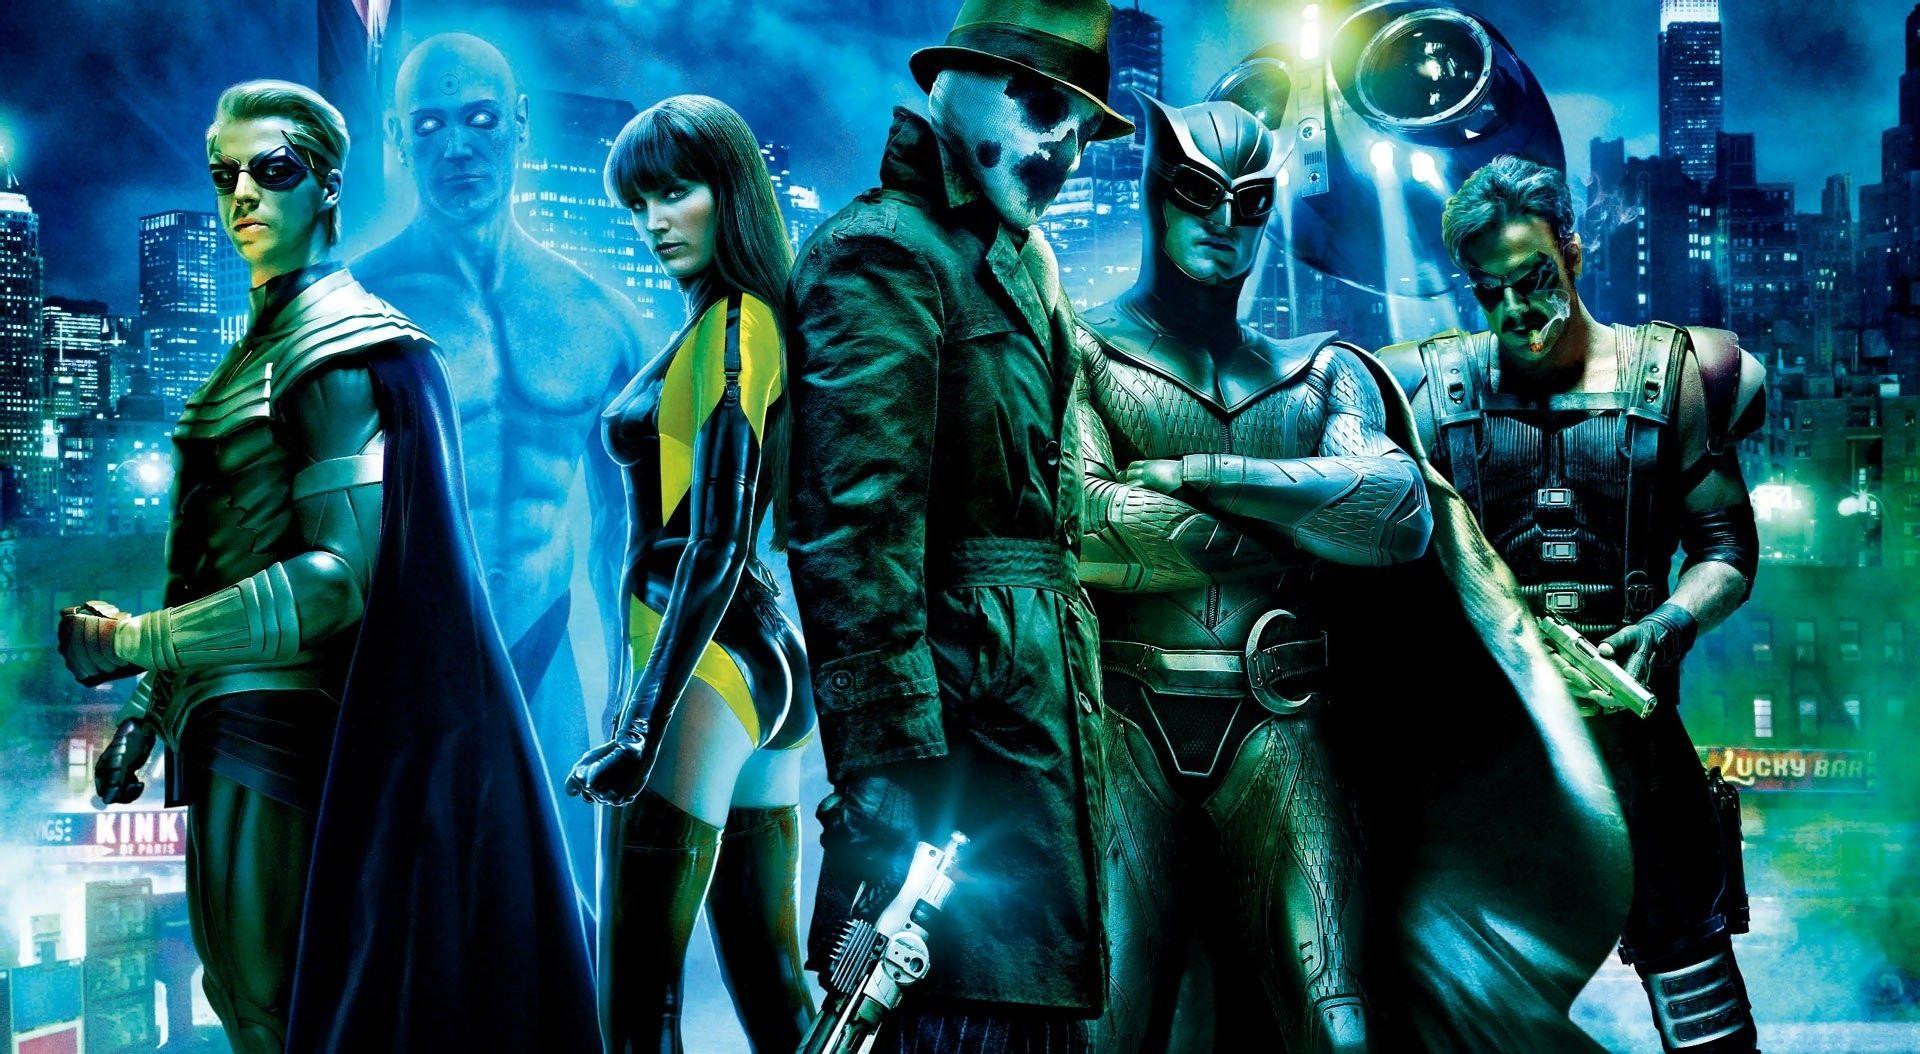 All superhero movie HD wallpaper